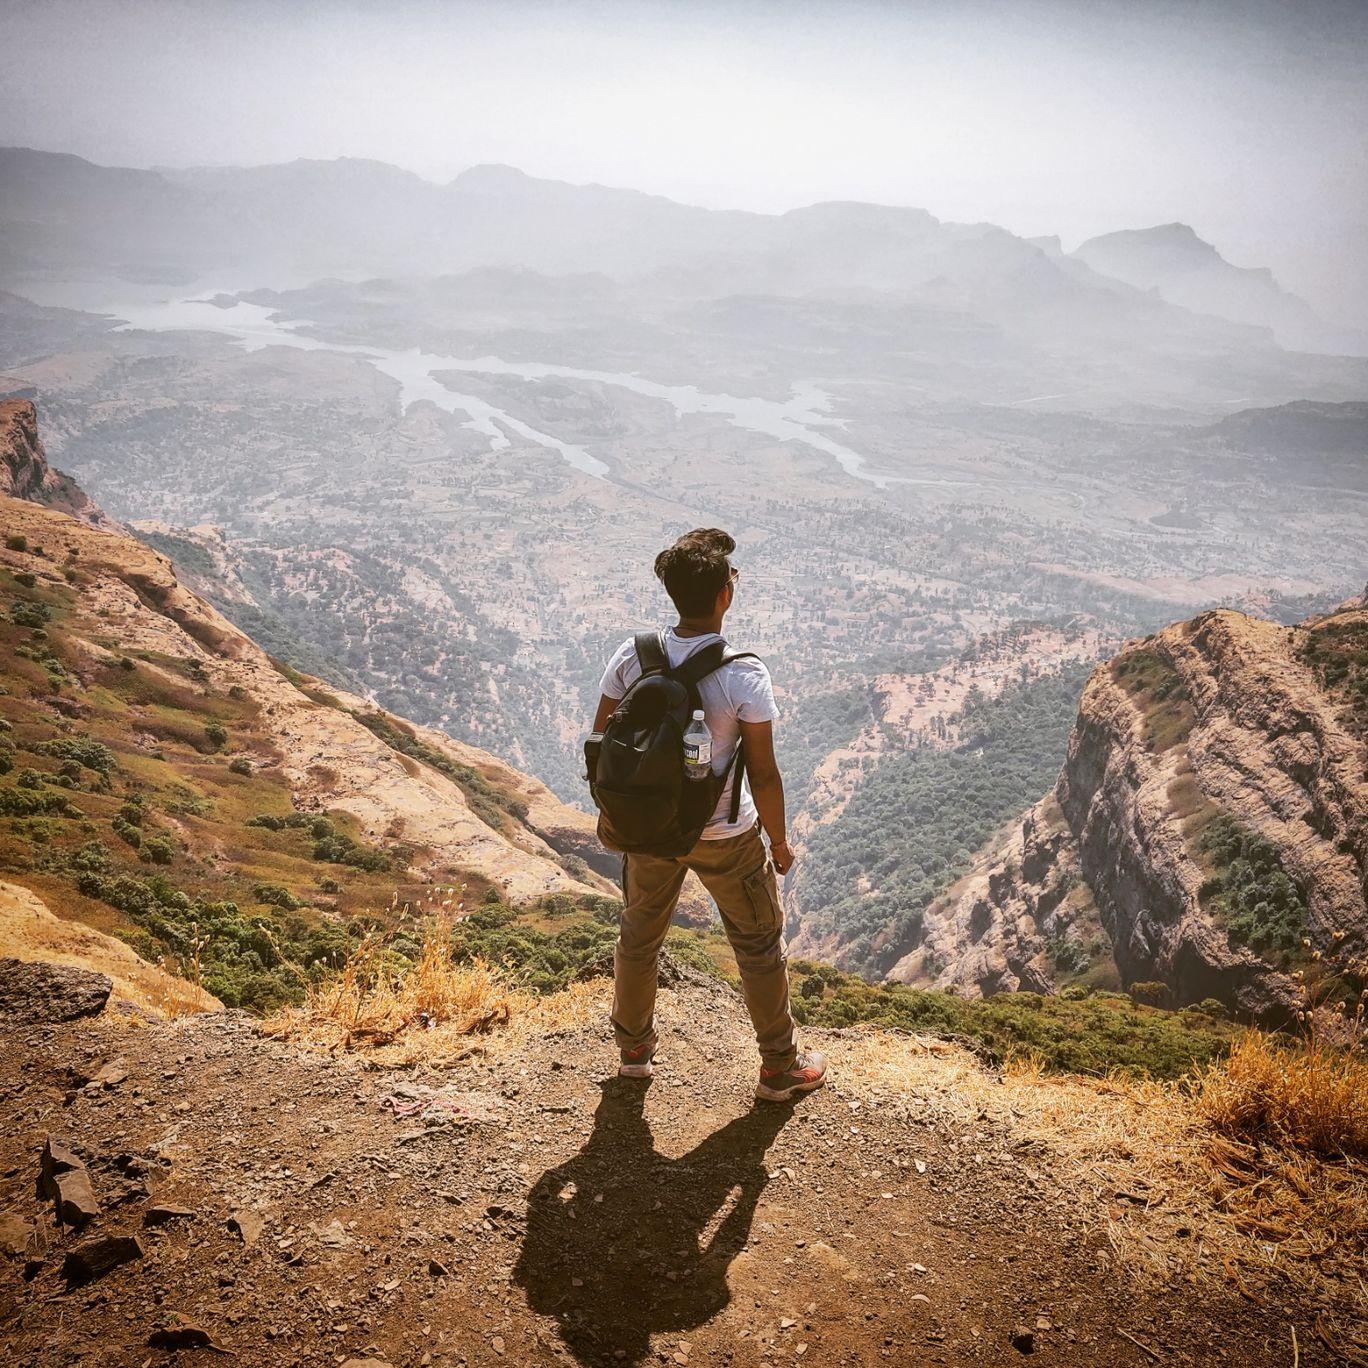 Photo of kalsubai Treking And Camping By Eeshan Sharma